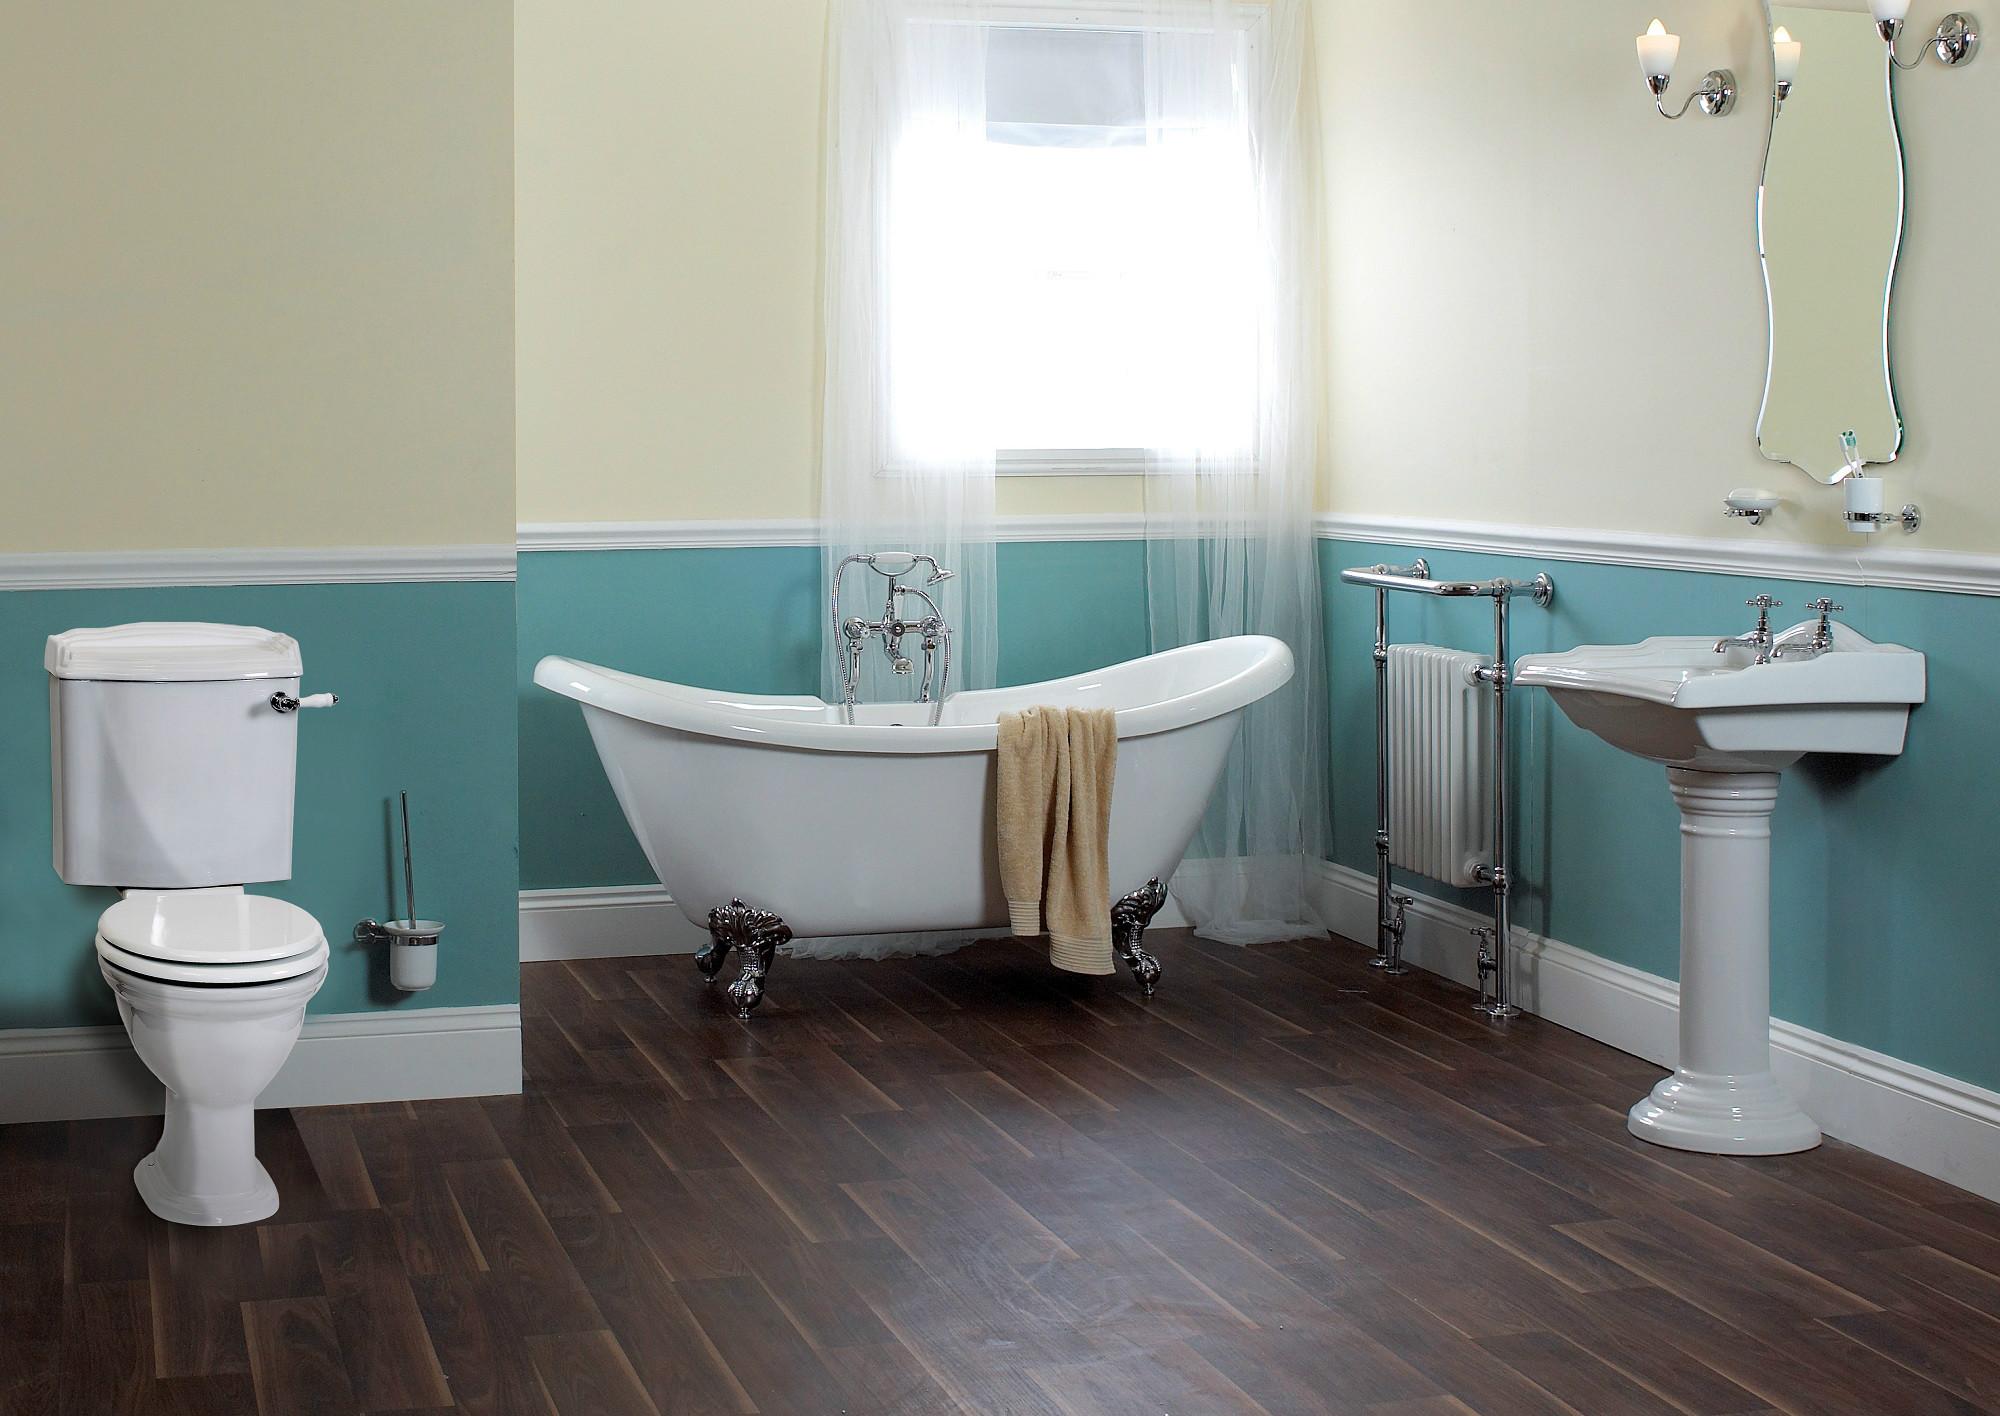 Bathroom Fitters South East London Bathroom Installation Bromley Croydon Dulwich